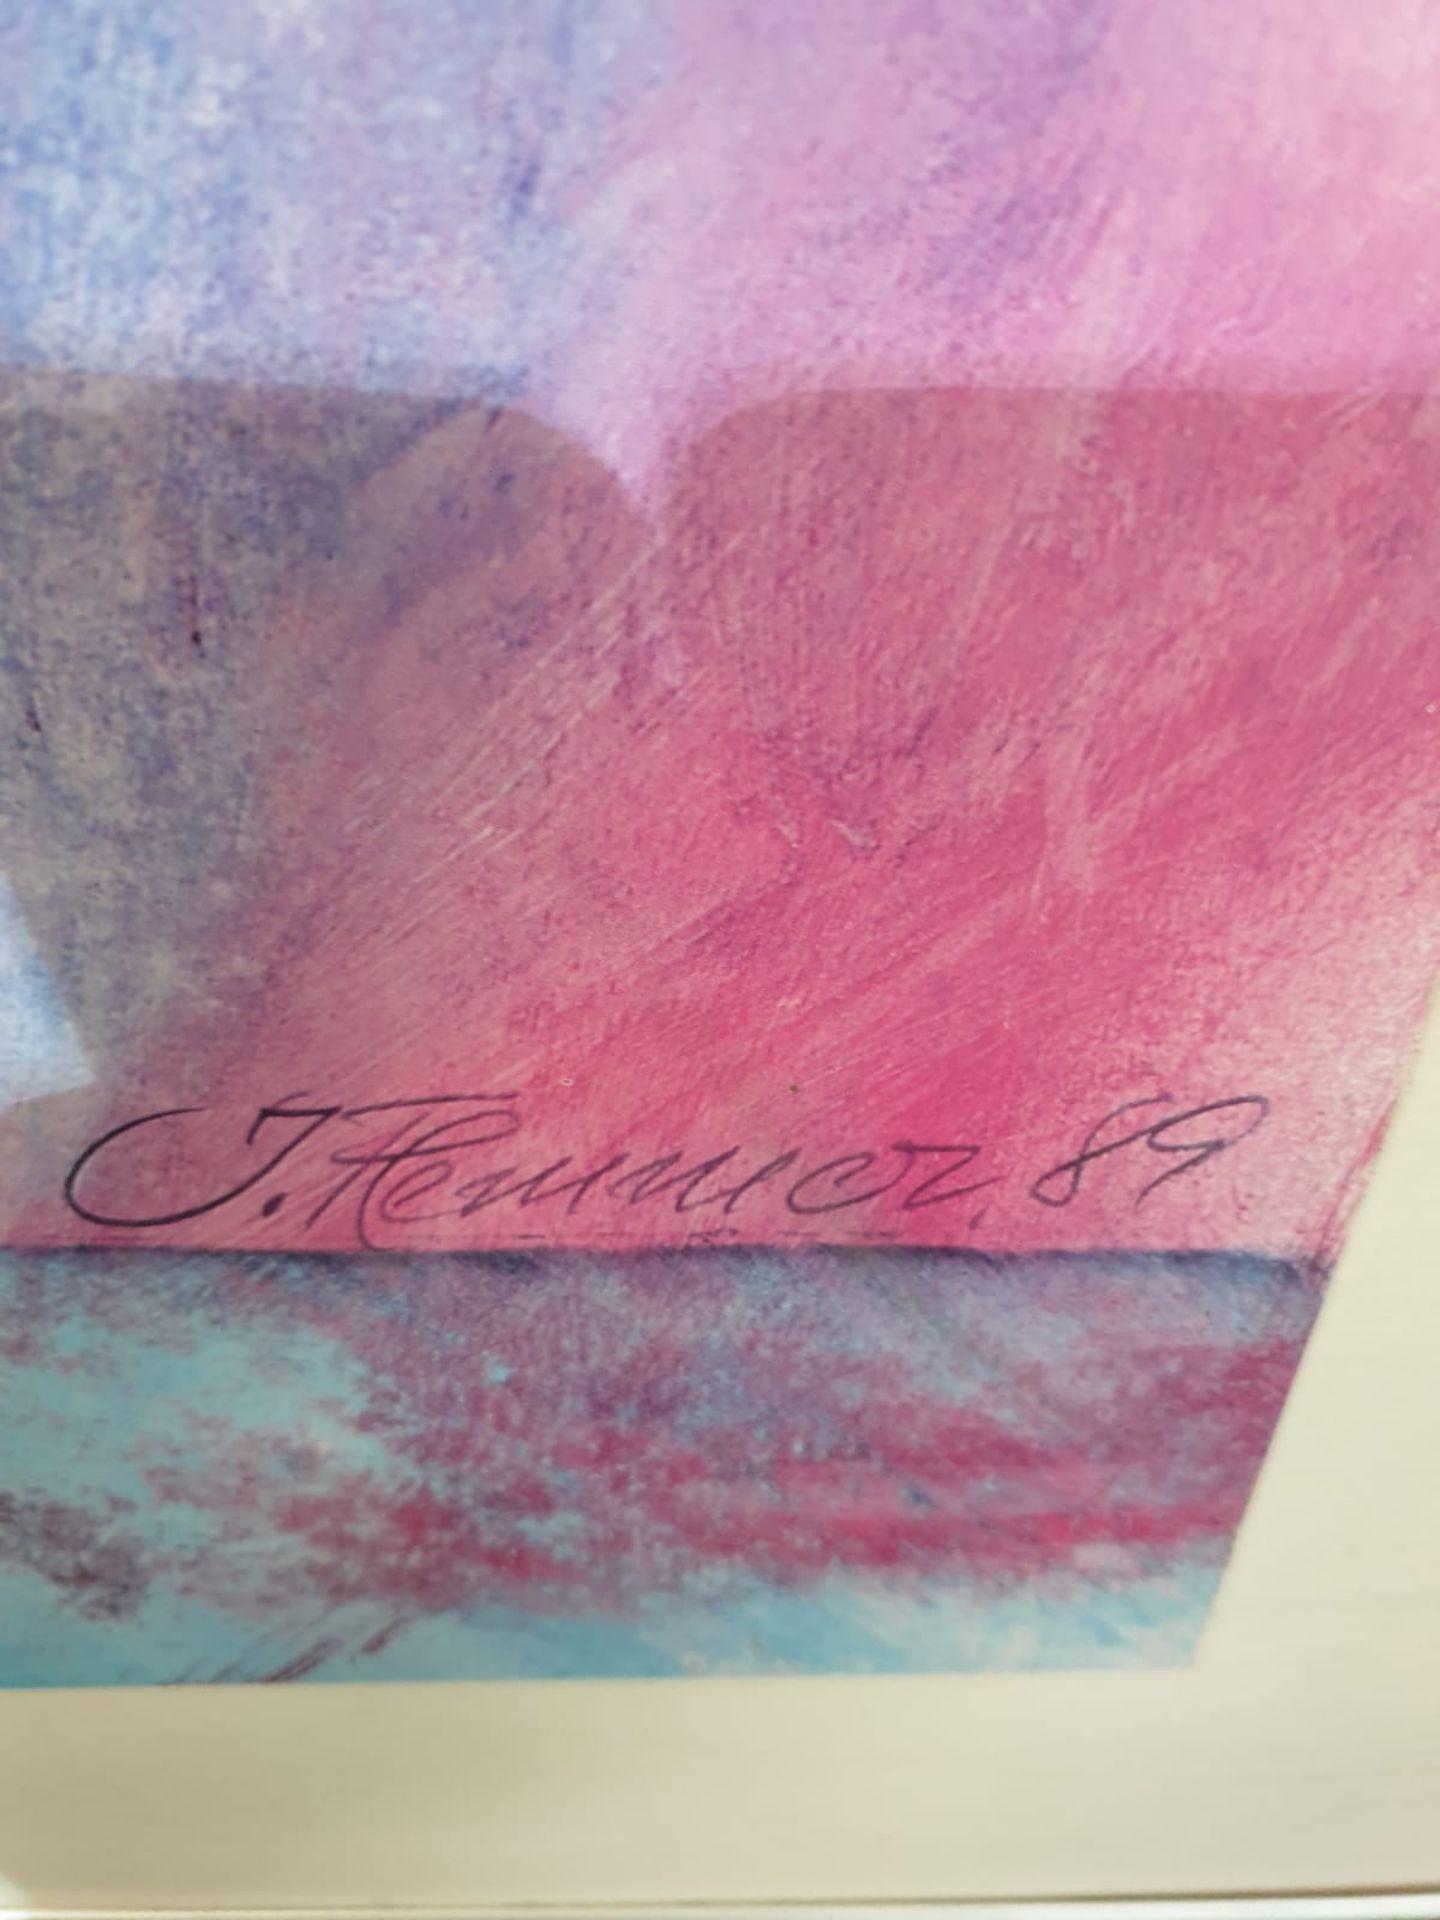 Abstract Blue/Purple wall art J. Hermasuez 89 91 x 111cm - Image 5 of 5